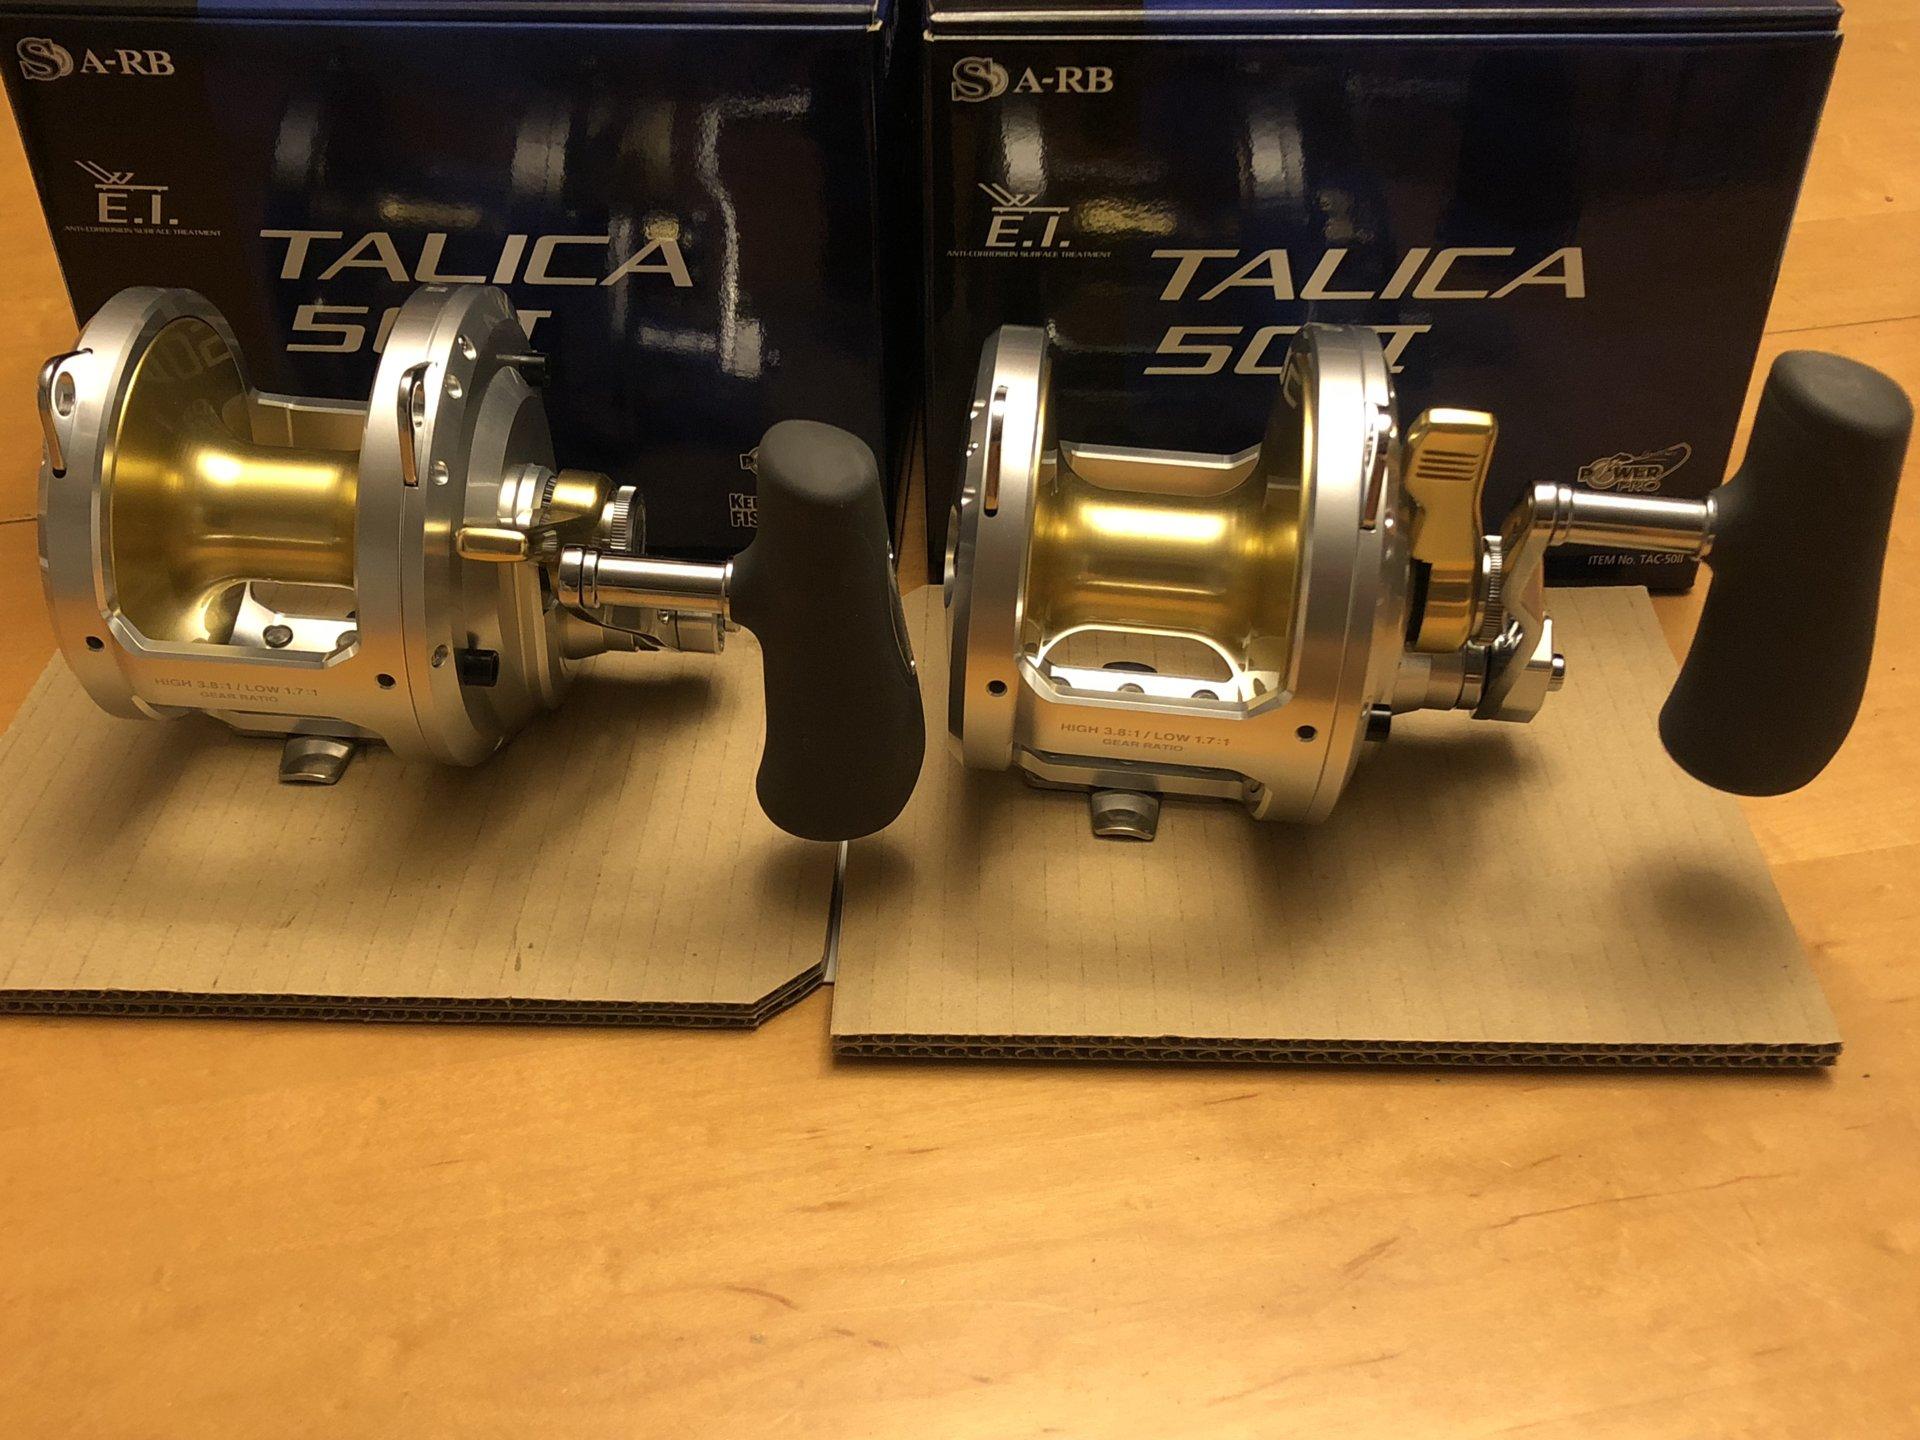 AEC1A2F8-7AF4-43BC-9A0F-D8584BF03A40.jpeg